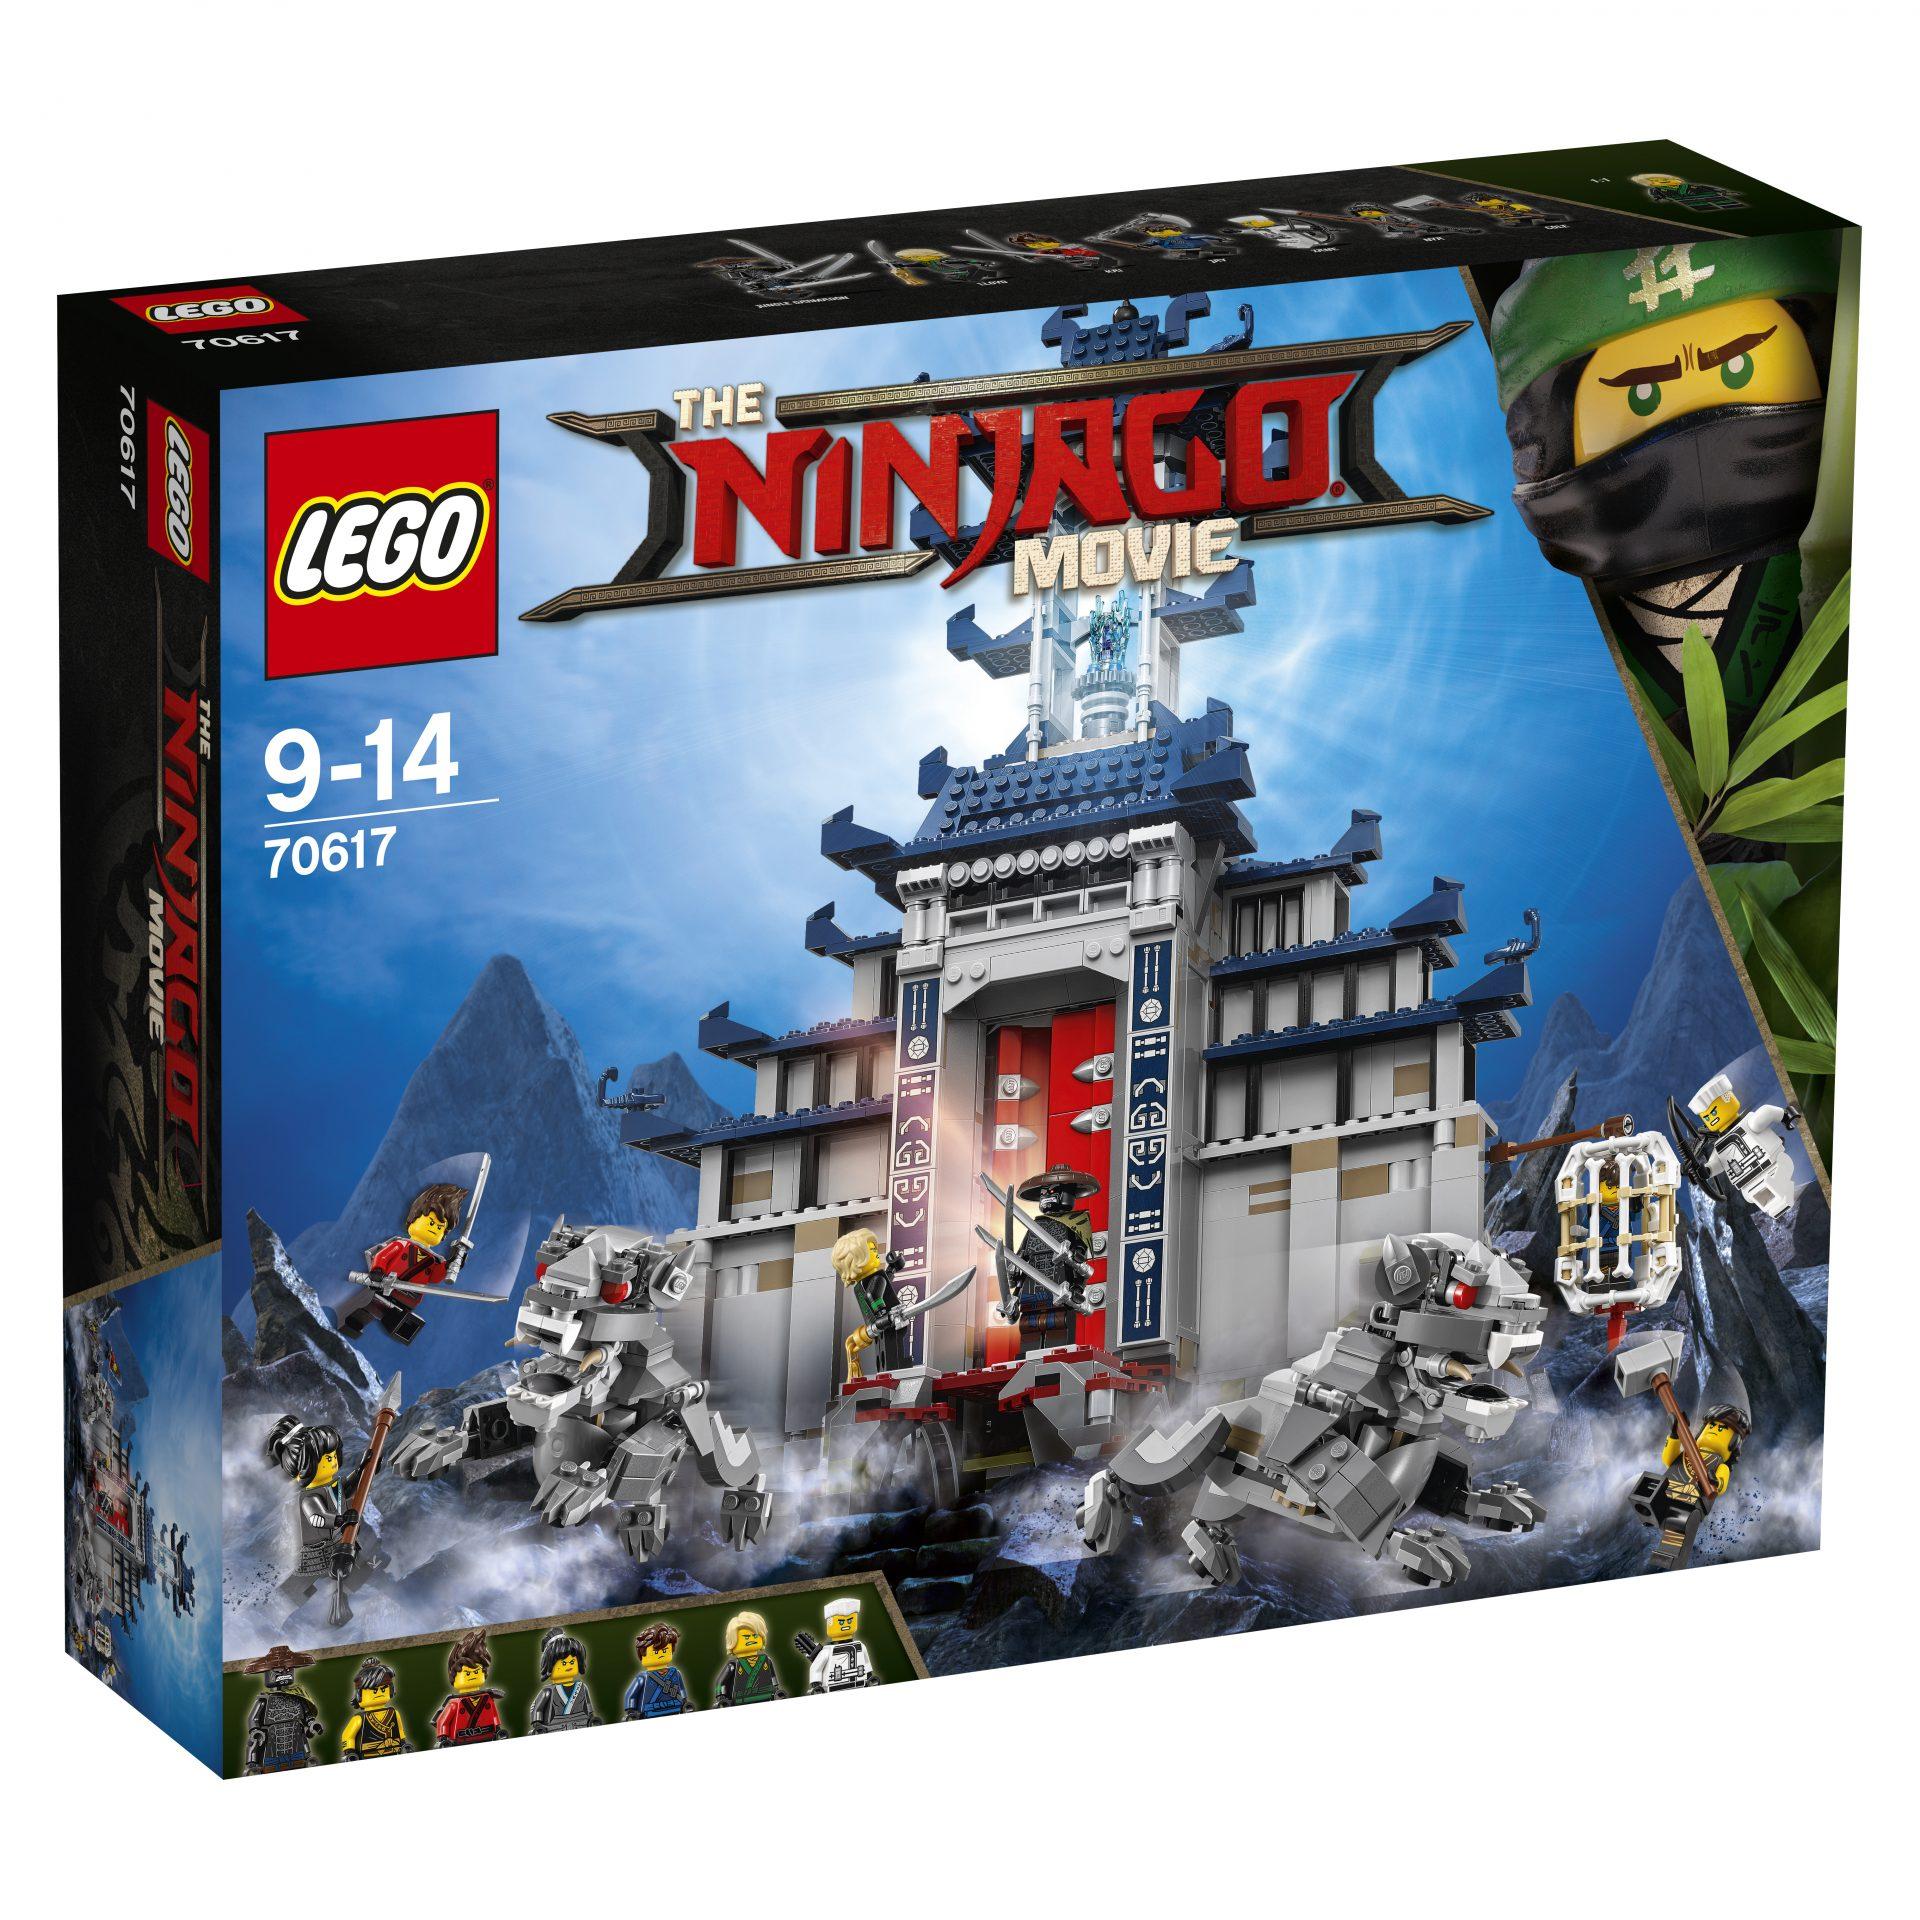 neue lego sets zu the lego ninjago movie. Black Bedroom Furniture Sets. Home Design Ideas